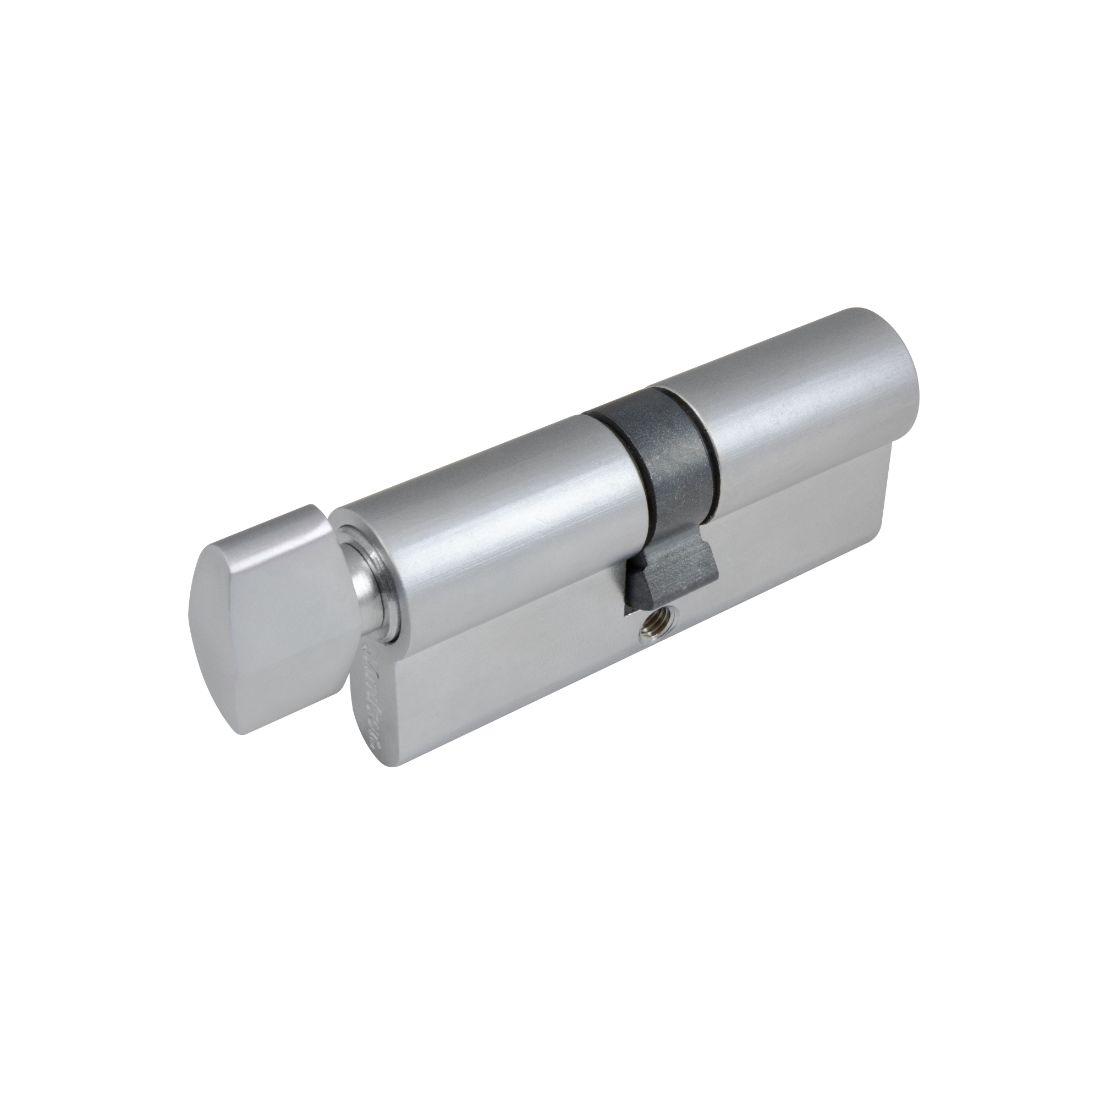 70mm 5 Pin Euro Cylinder Key/Snib Satin Chrome